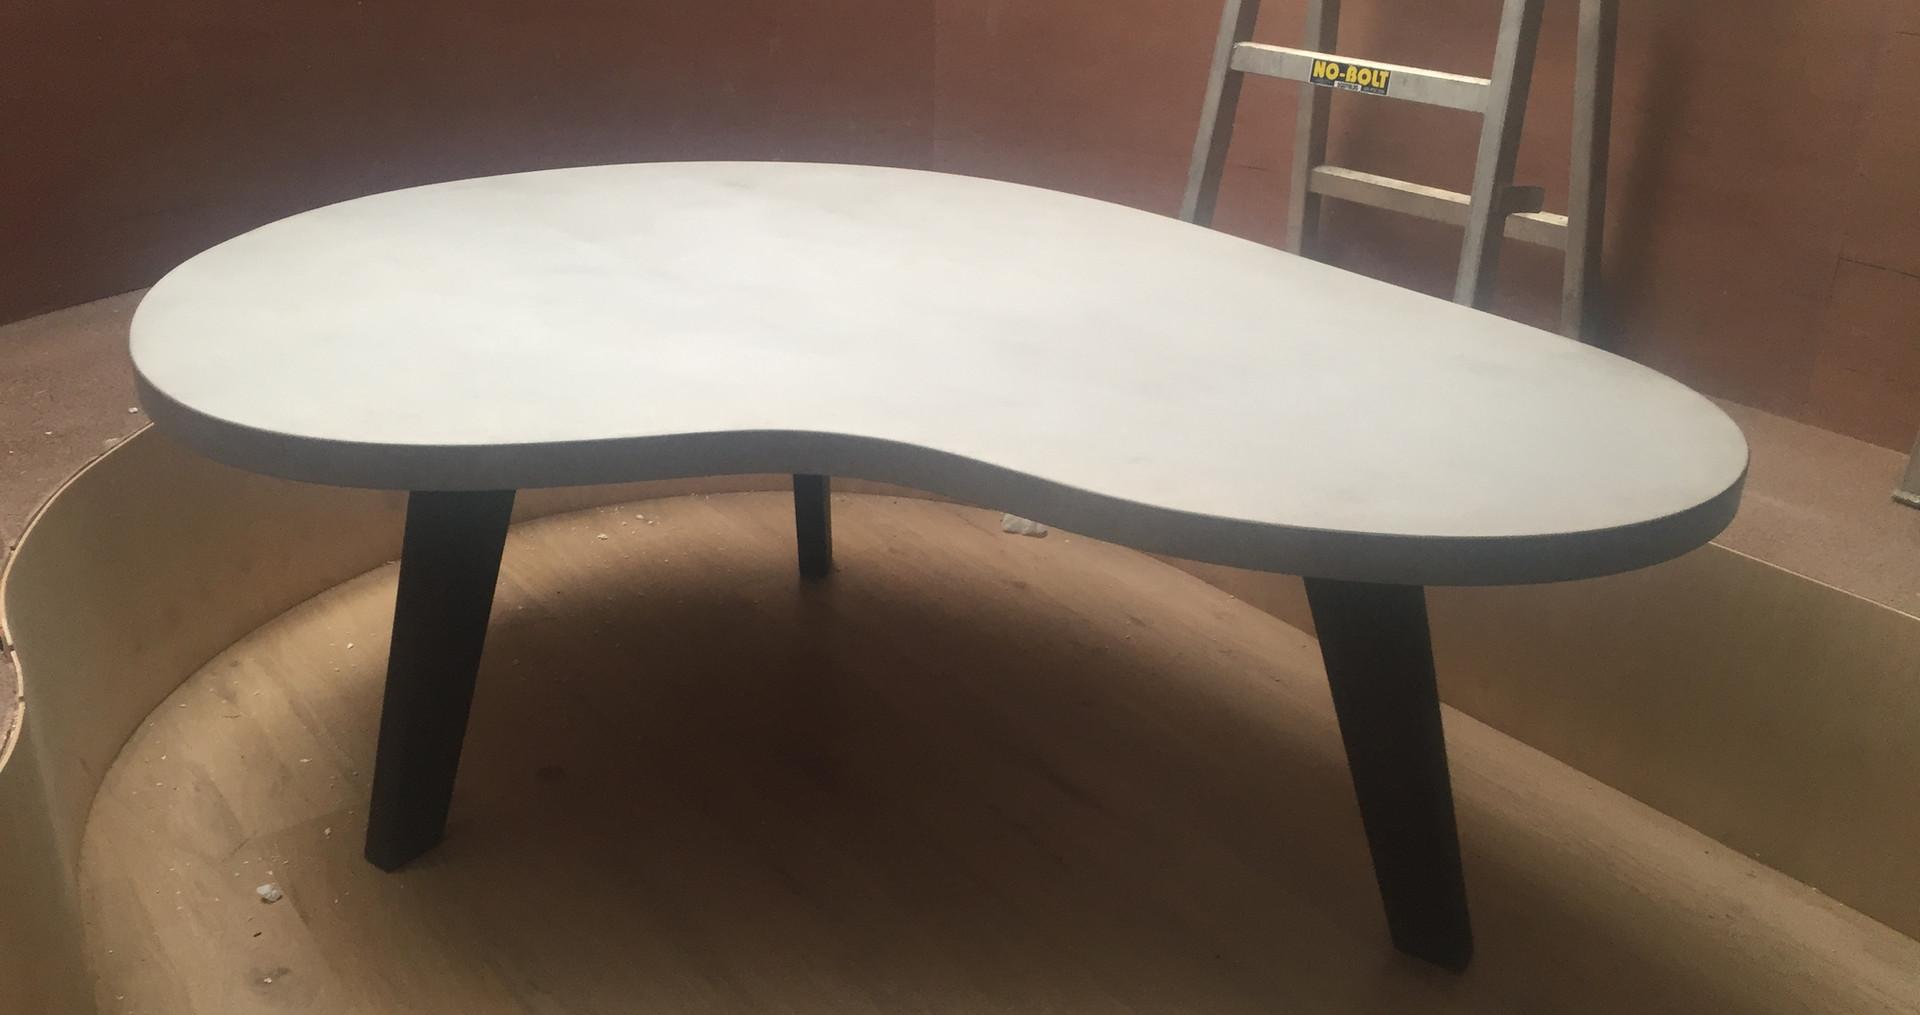 FORM Kidney Concrete Table Top.JPG